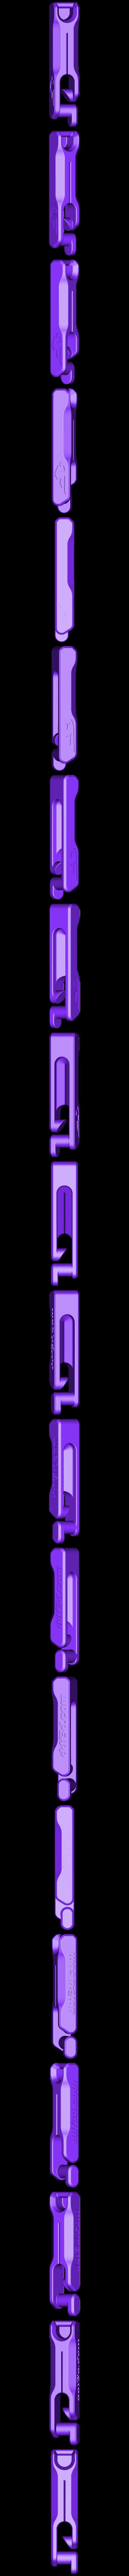 DD007.STL Download free STL file Origami Carabiner by ddf3d.com • 3D printable design, Pwenyrr